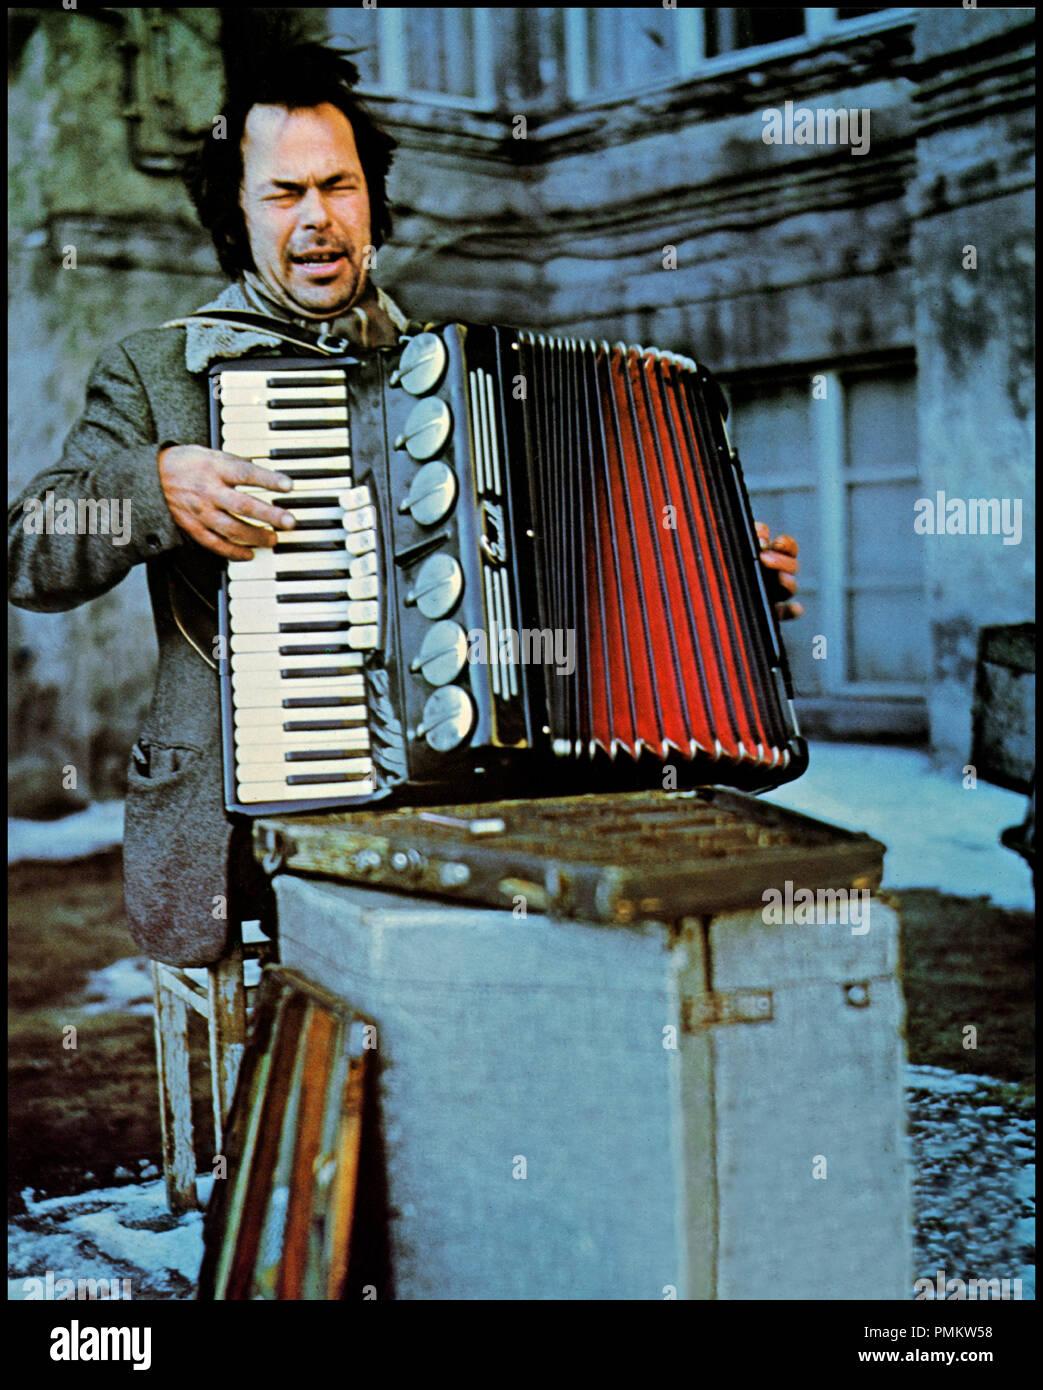 Prod DB © Skellig Edition - Werner Herzog Filmproduktion - ZDF / DR LA BALLADE DE BRUNO (STROSZEK) de Werner Herzog 1977 ALL. avec Bruno S. musicien de rue, accordeon Stock Photo